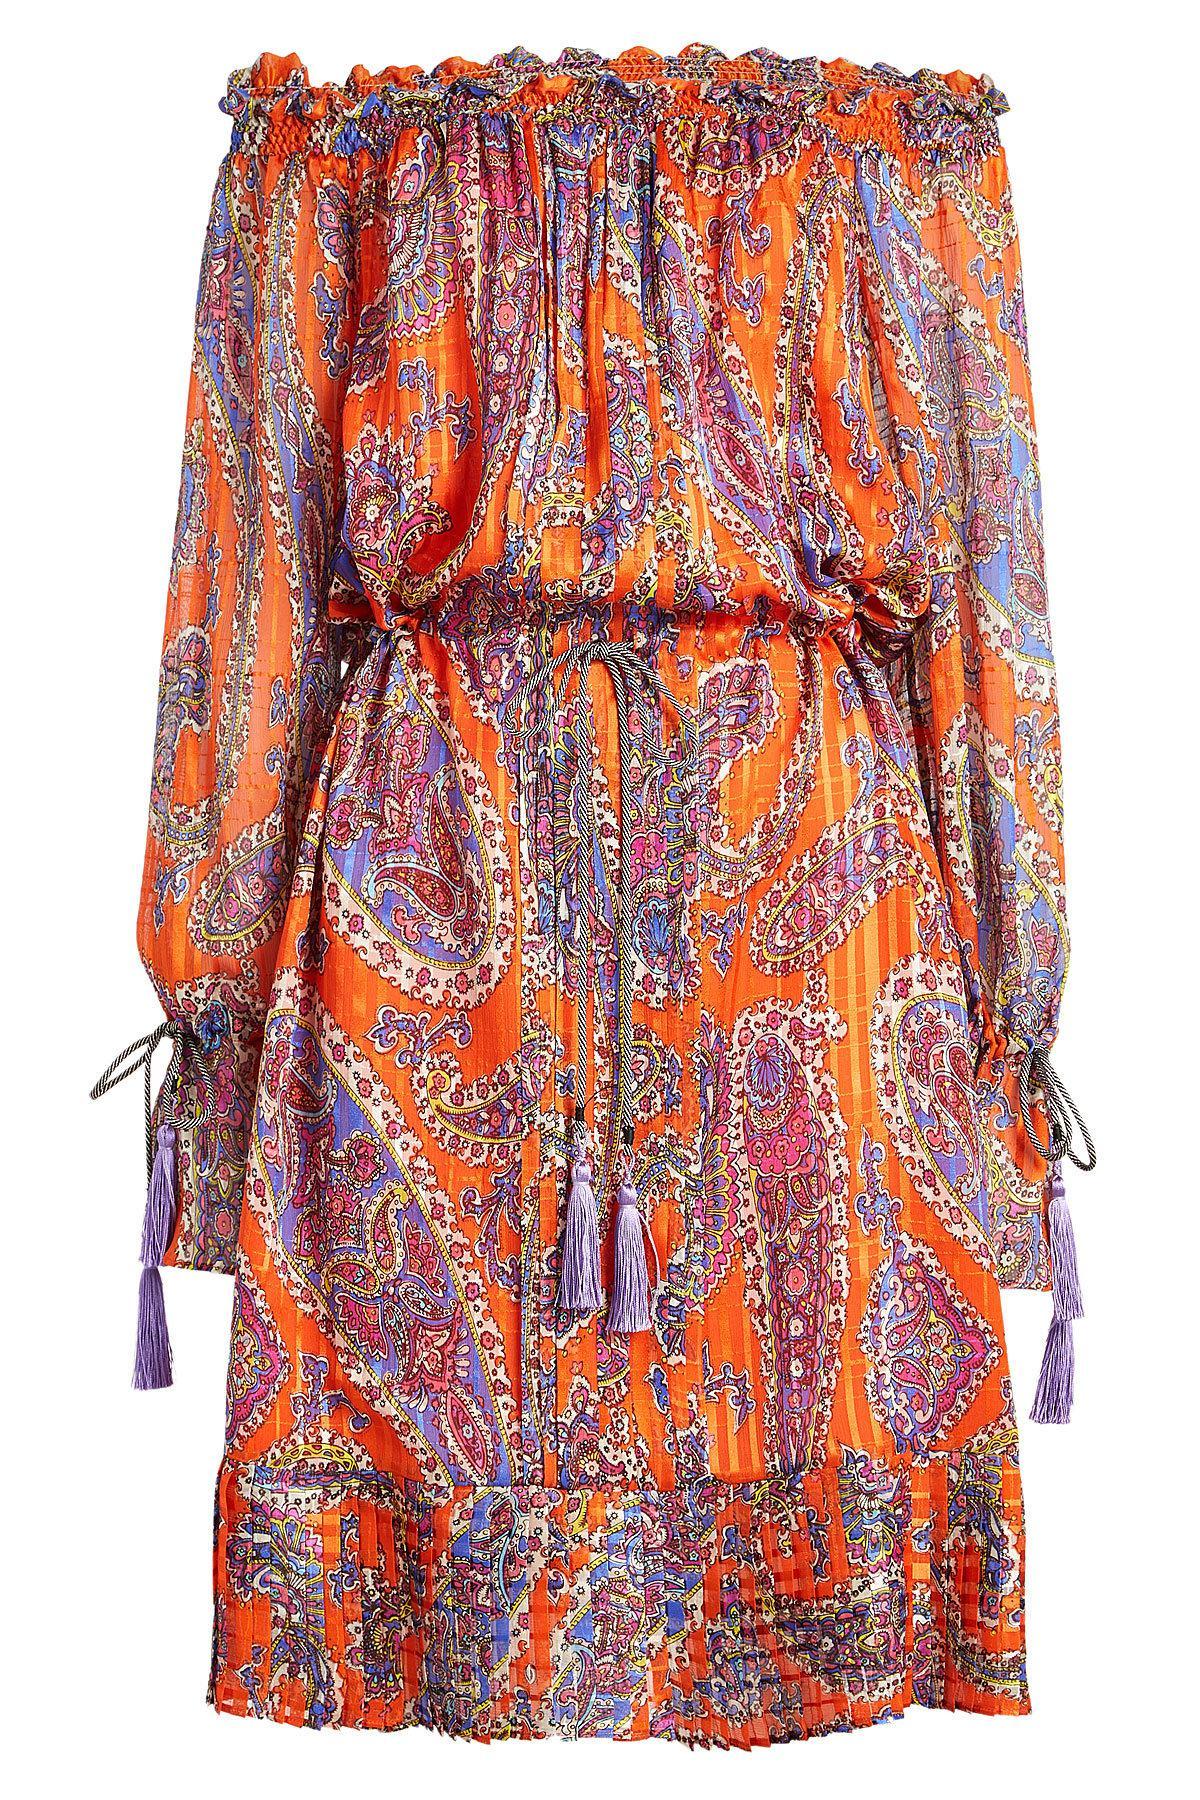 Etro. Women's Red Off-shoulder Printed Silk Dress